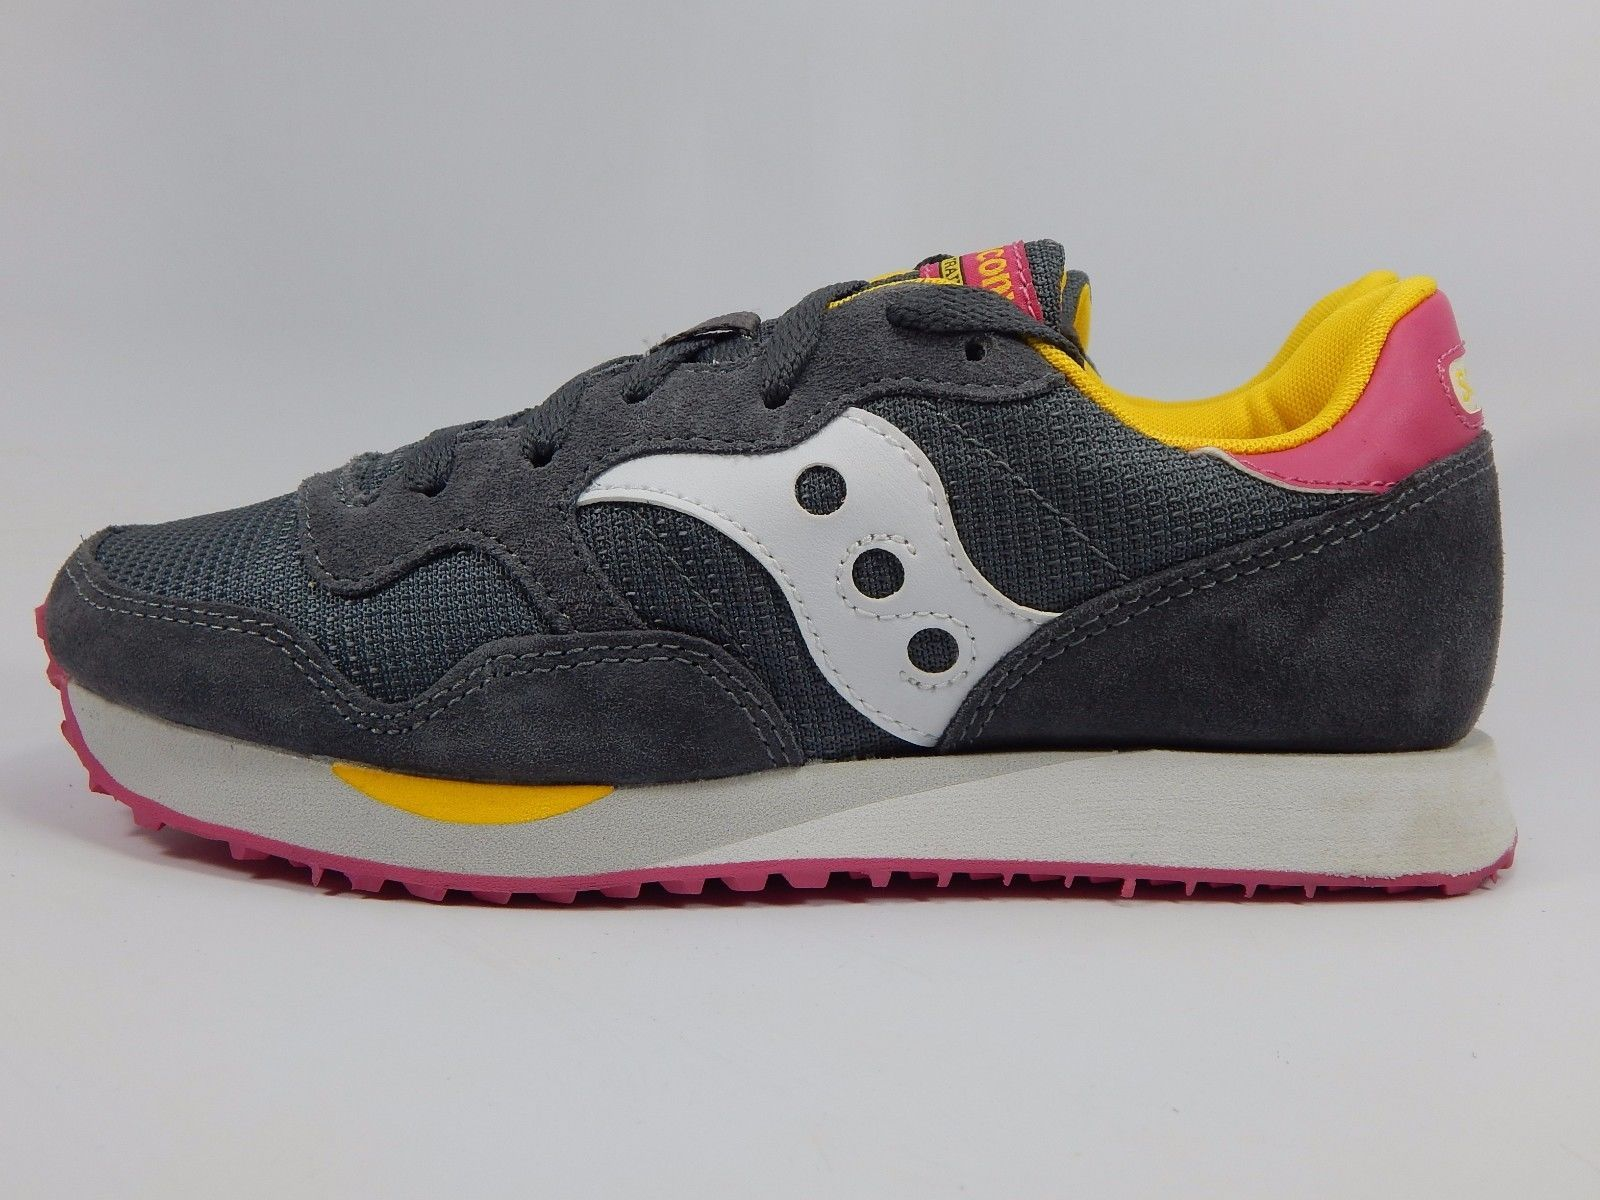 Saucony Original DXN Trainer Women's Running Shoes Size 7 M (B) EU 38 S60124-26